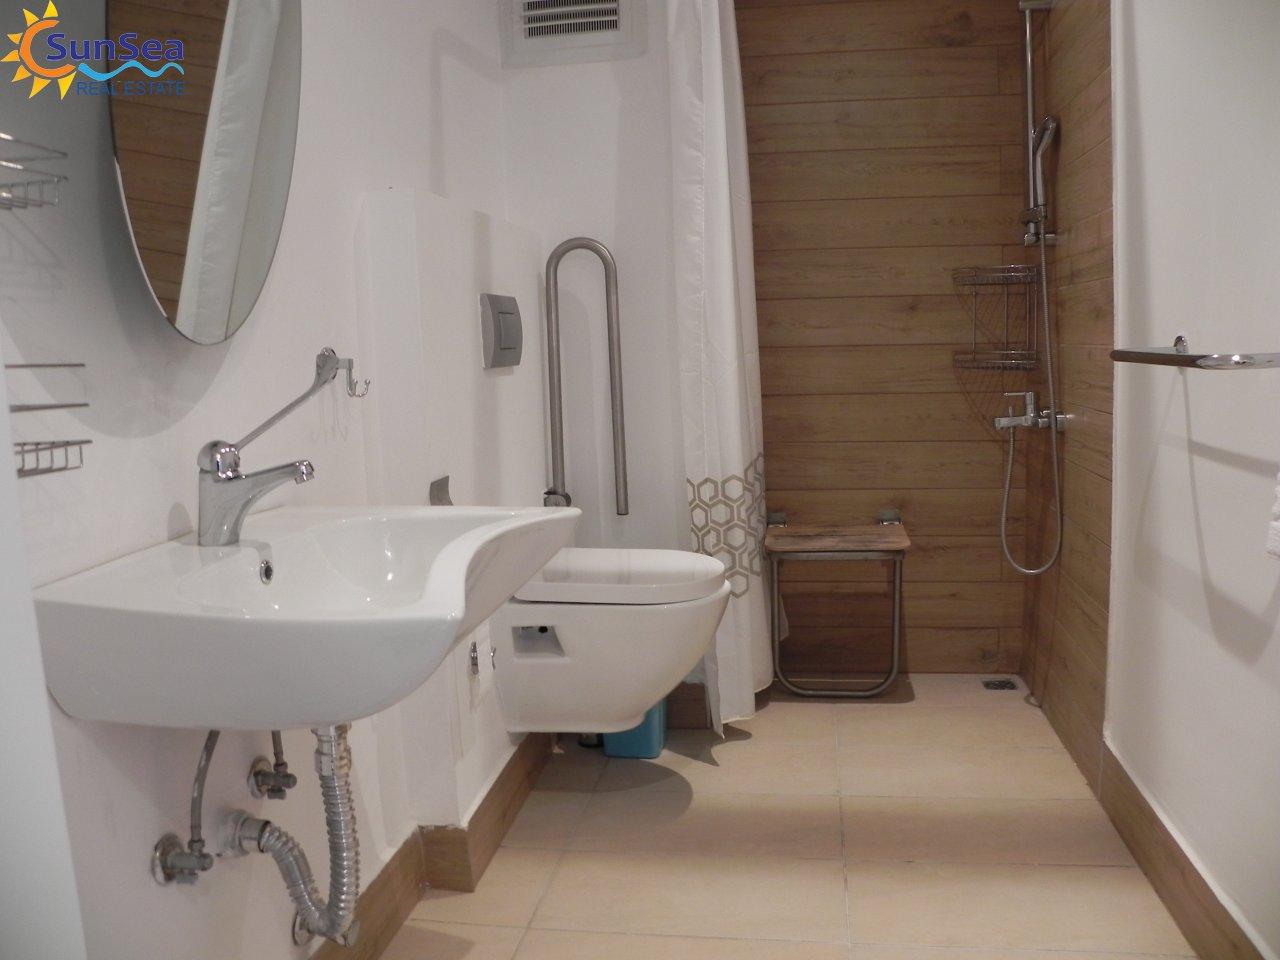 Alanya Fortuna Resort shower